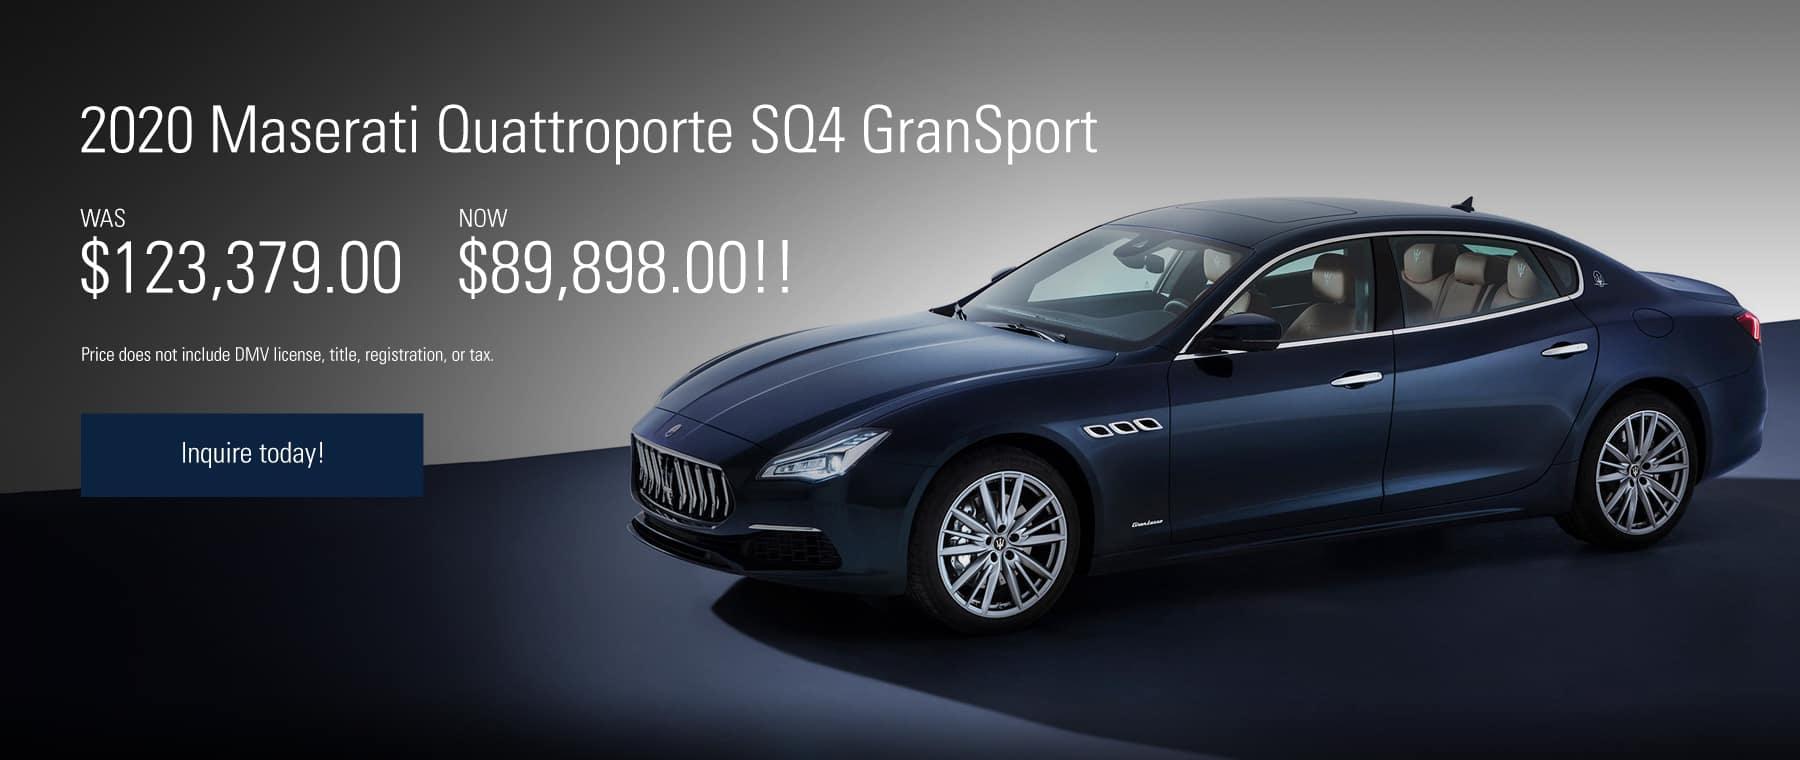 2020 Quattroporte Offer, WAS $123,379.00, NOW $89,898.00!!